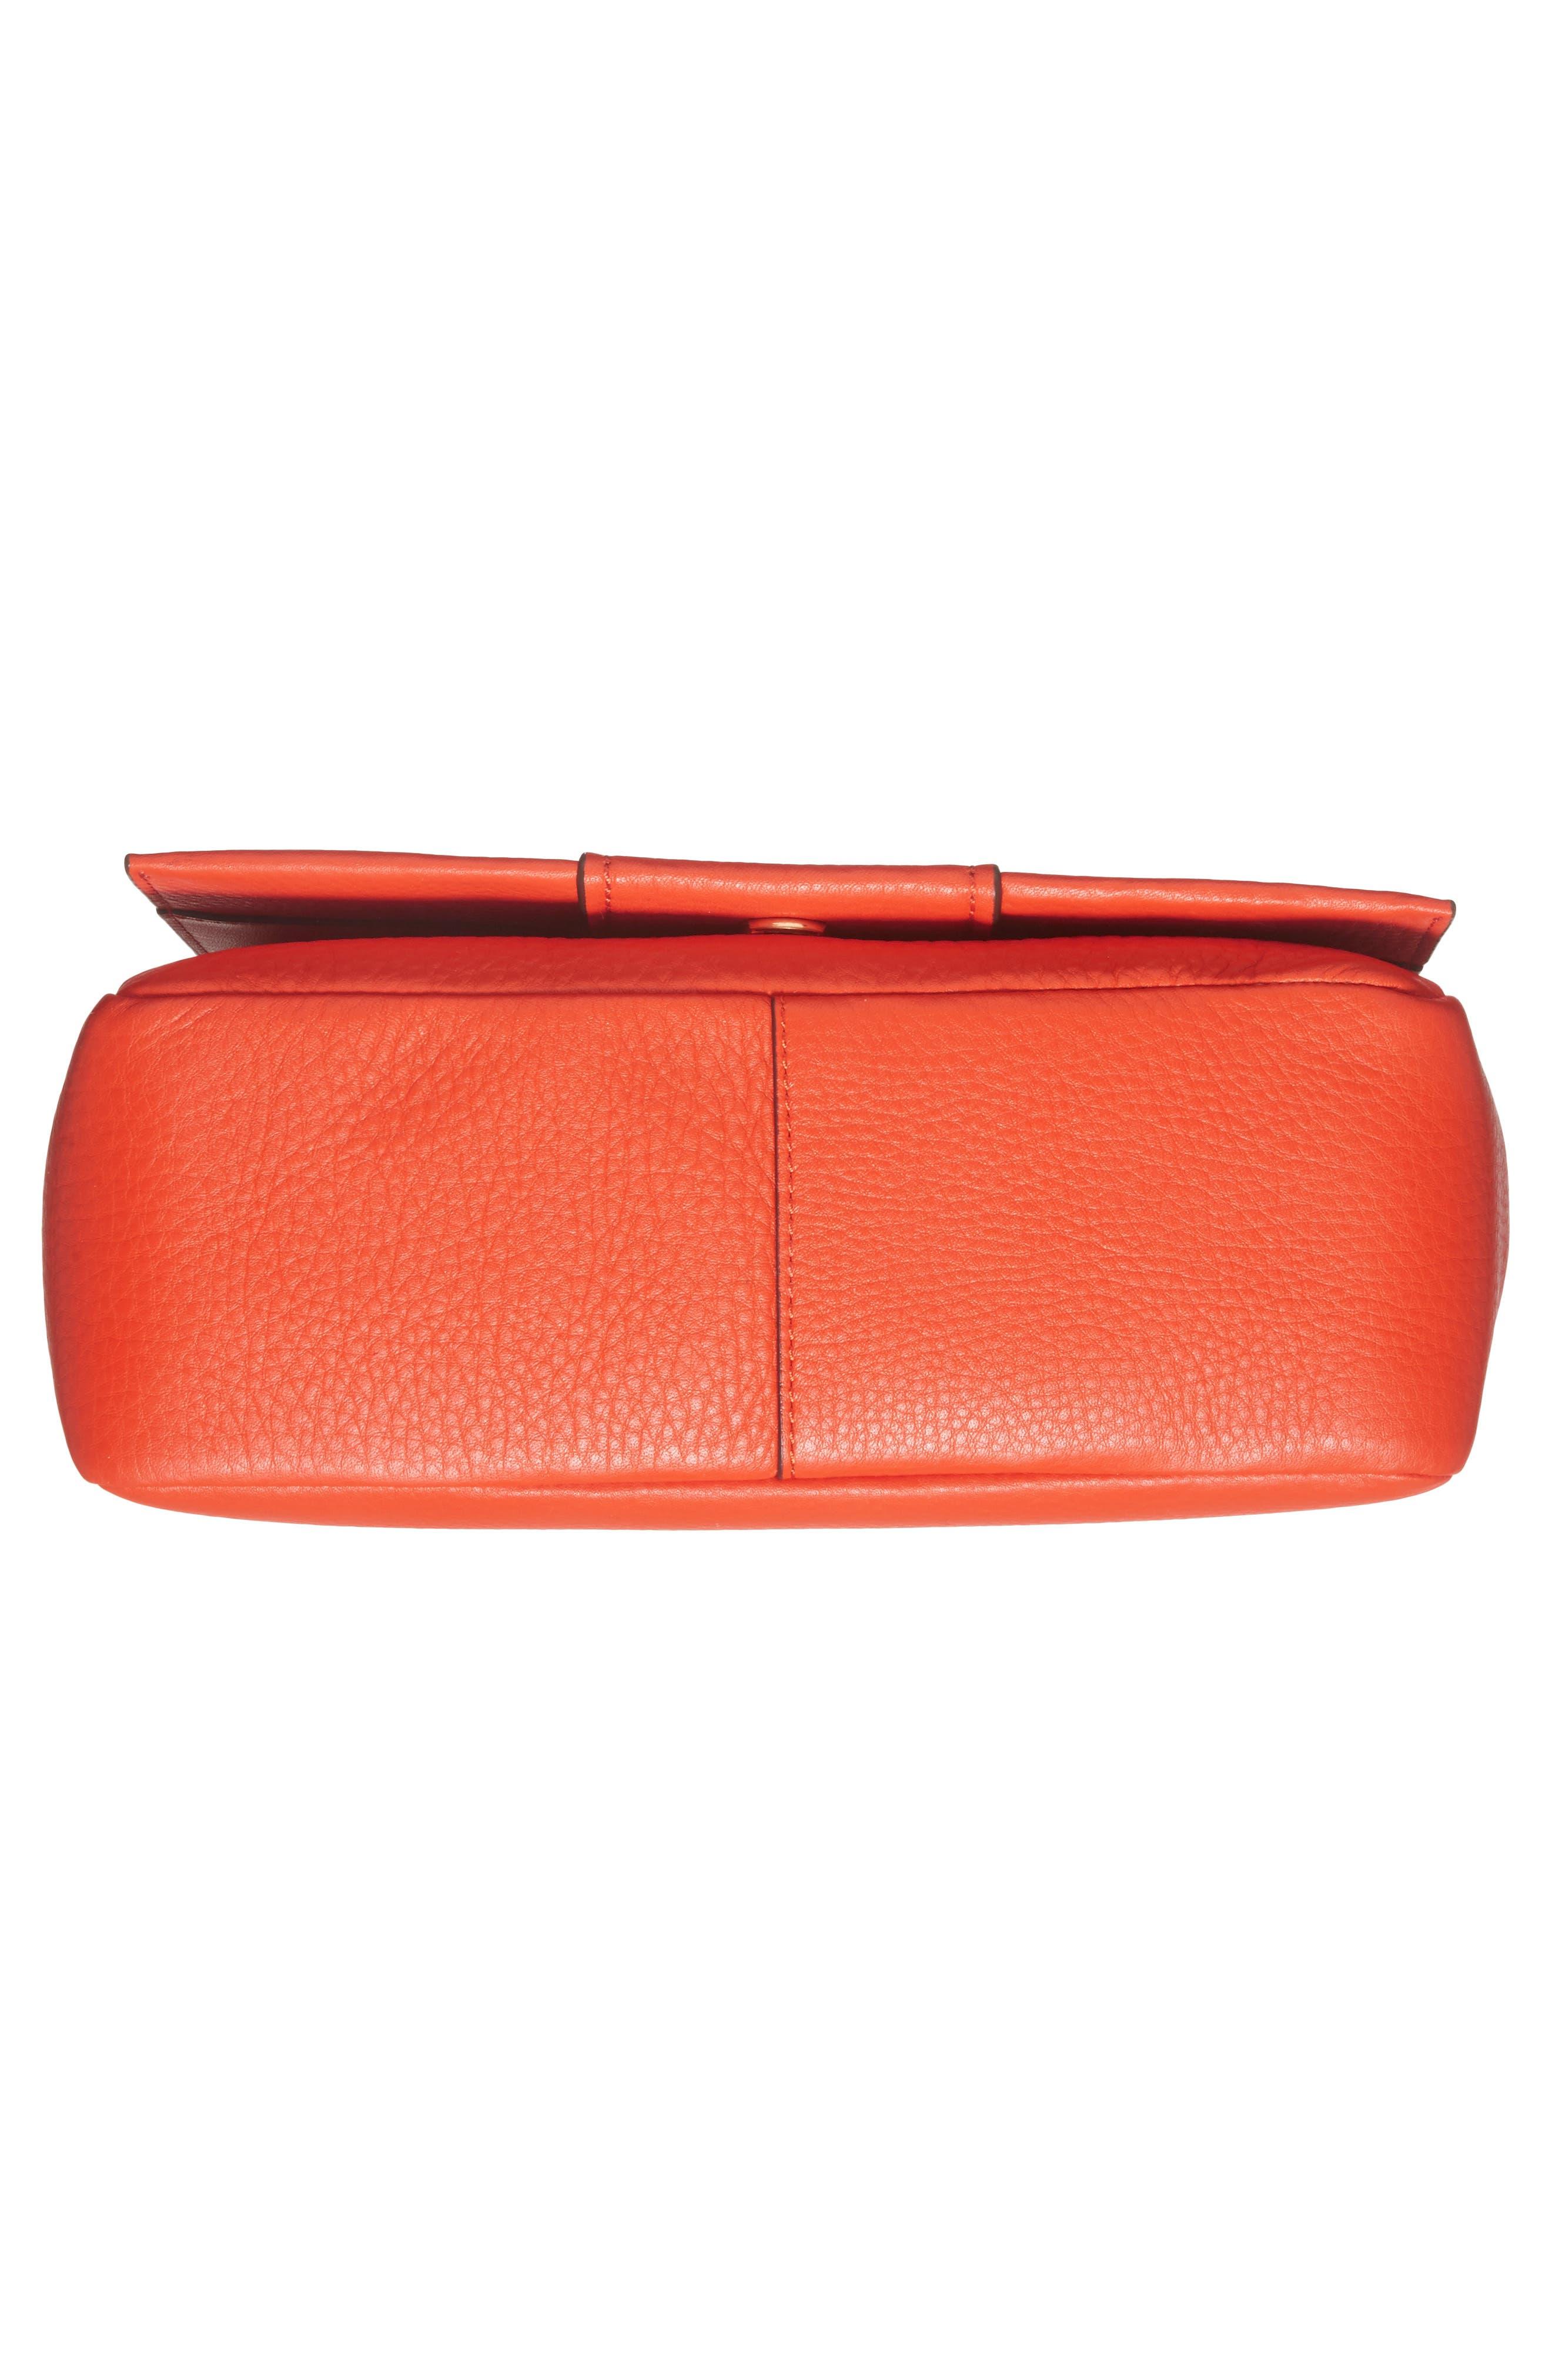 Block-T Pebbled Leather Shoulder Bag,                             Alternate thumbnail 6, color,                             Spicy Orange